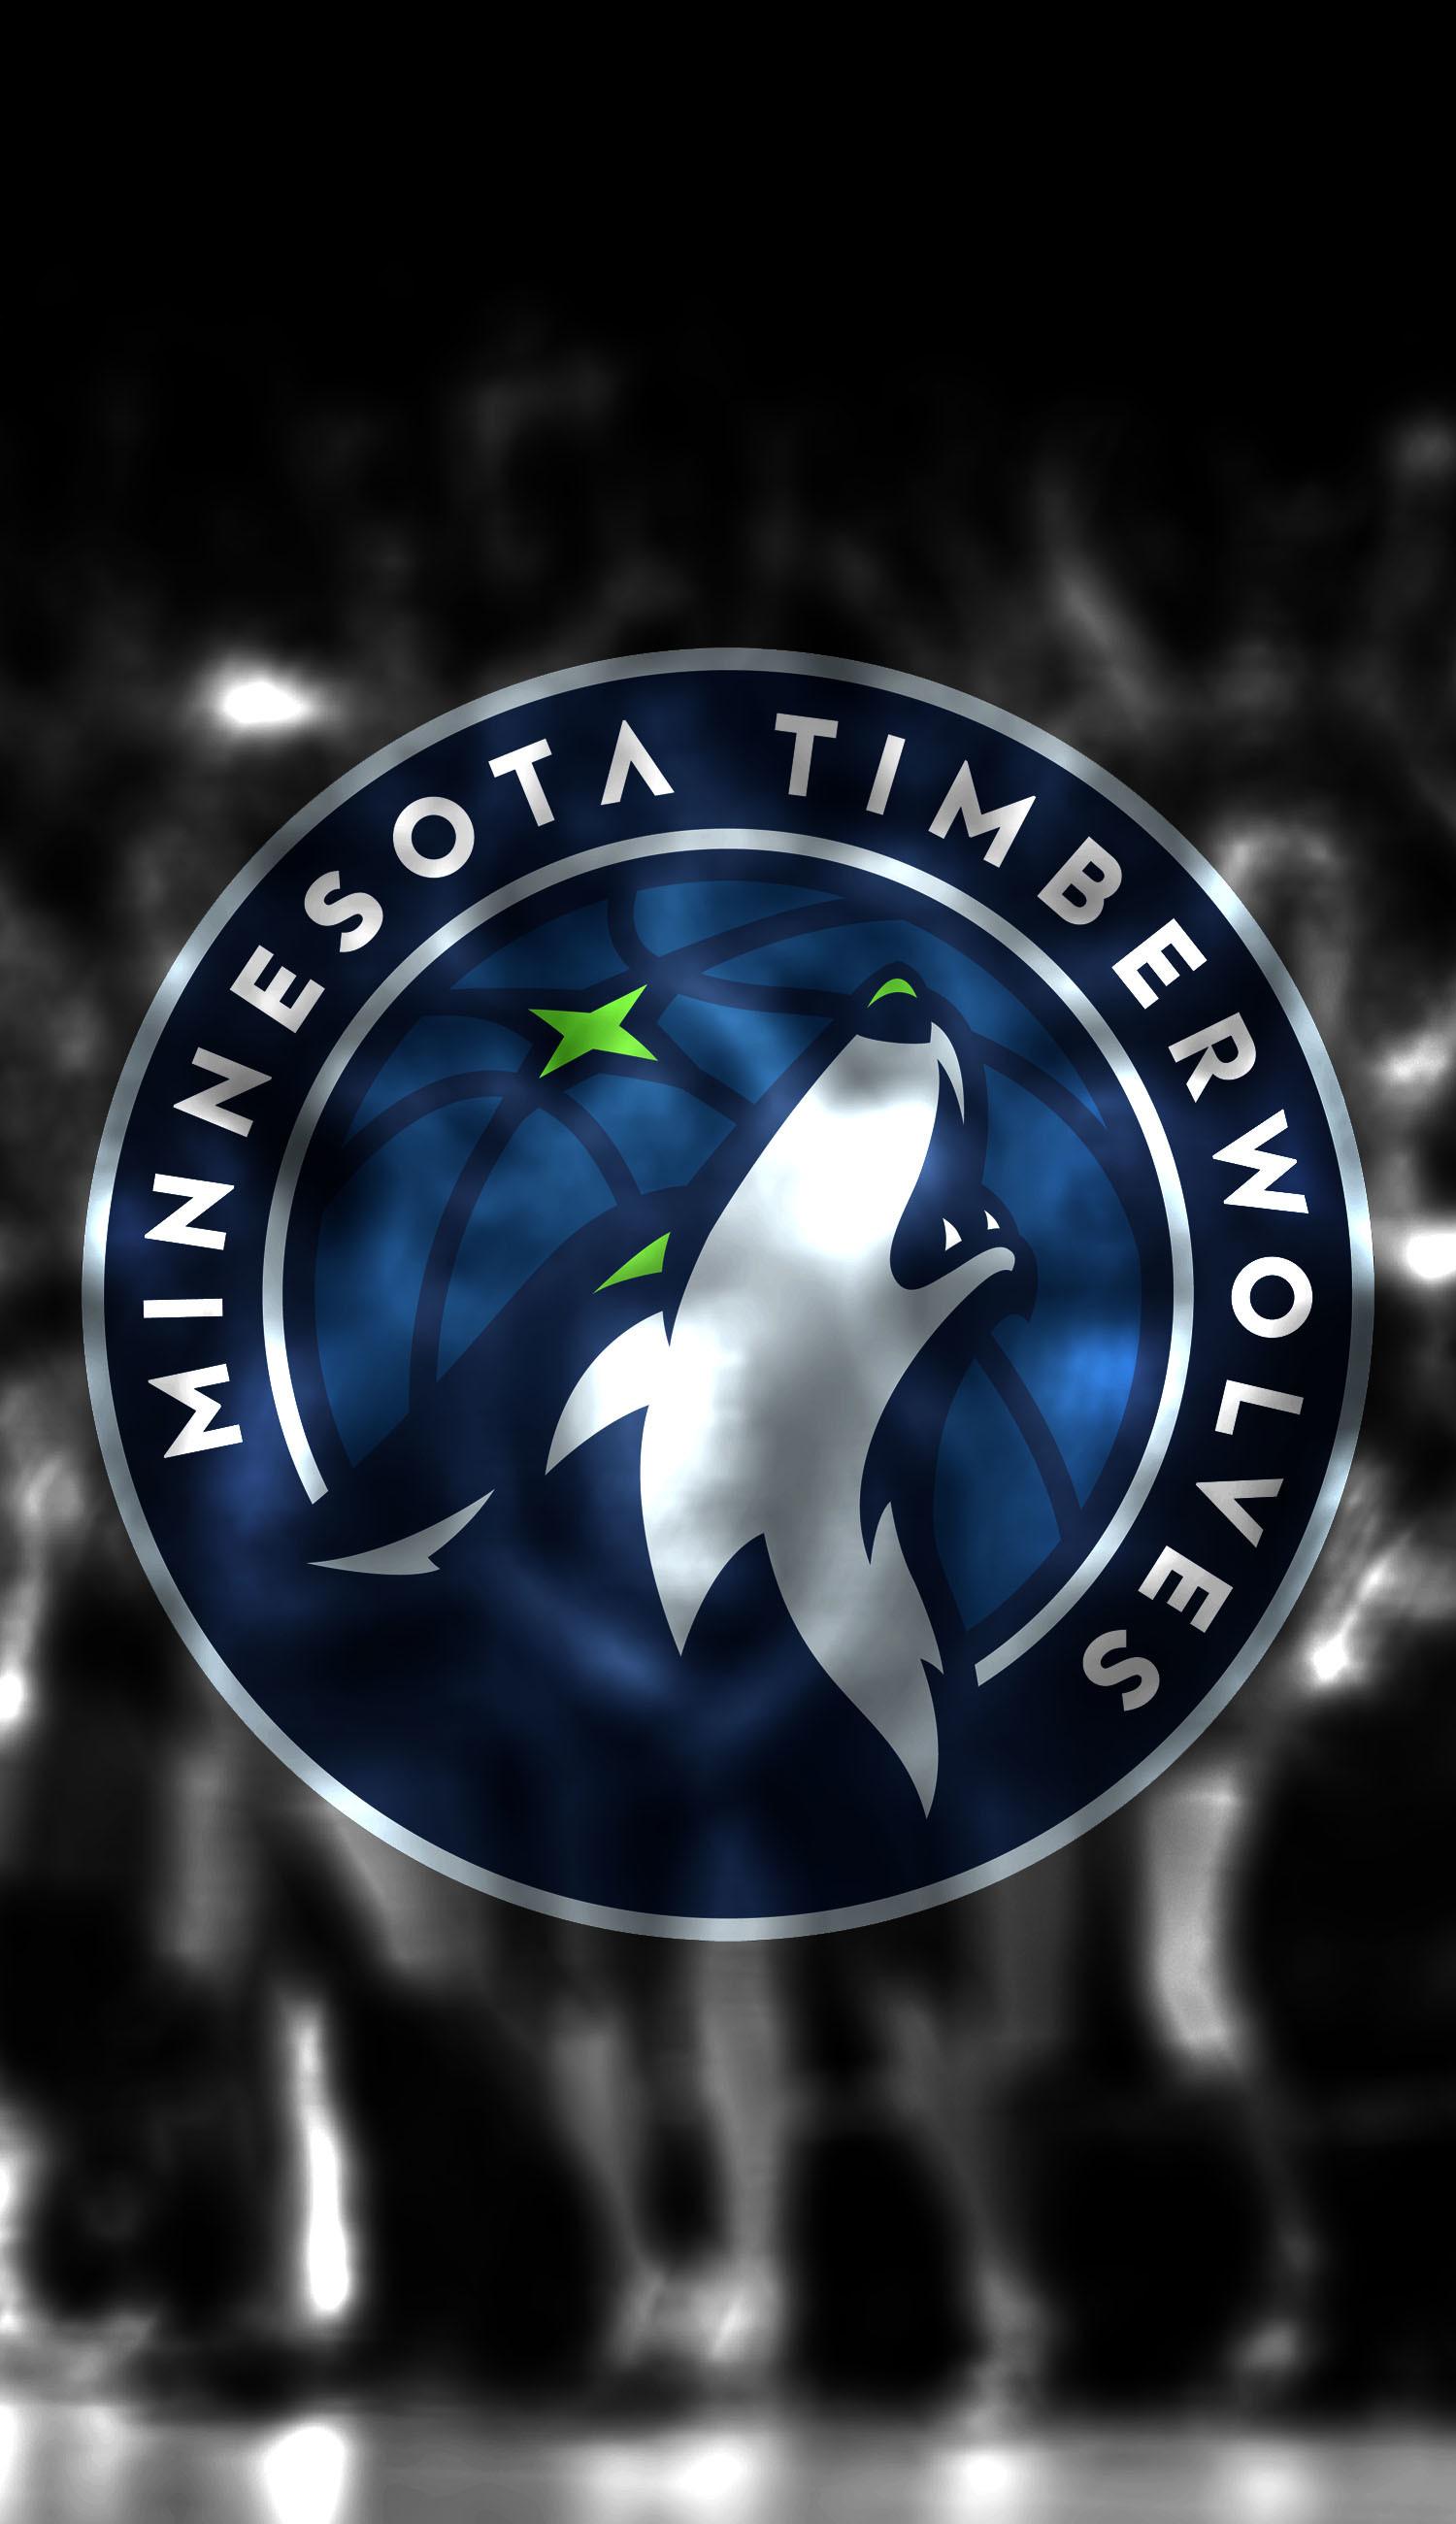 Minnesota Timberwolves Wallpaper 56 images 1500x2600